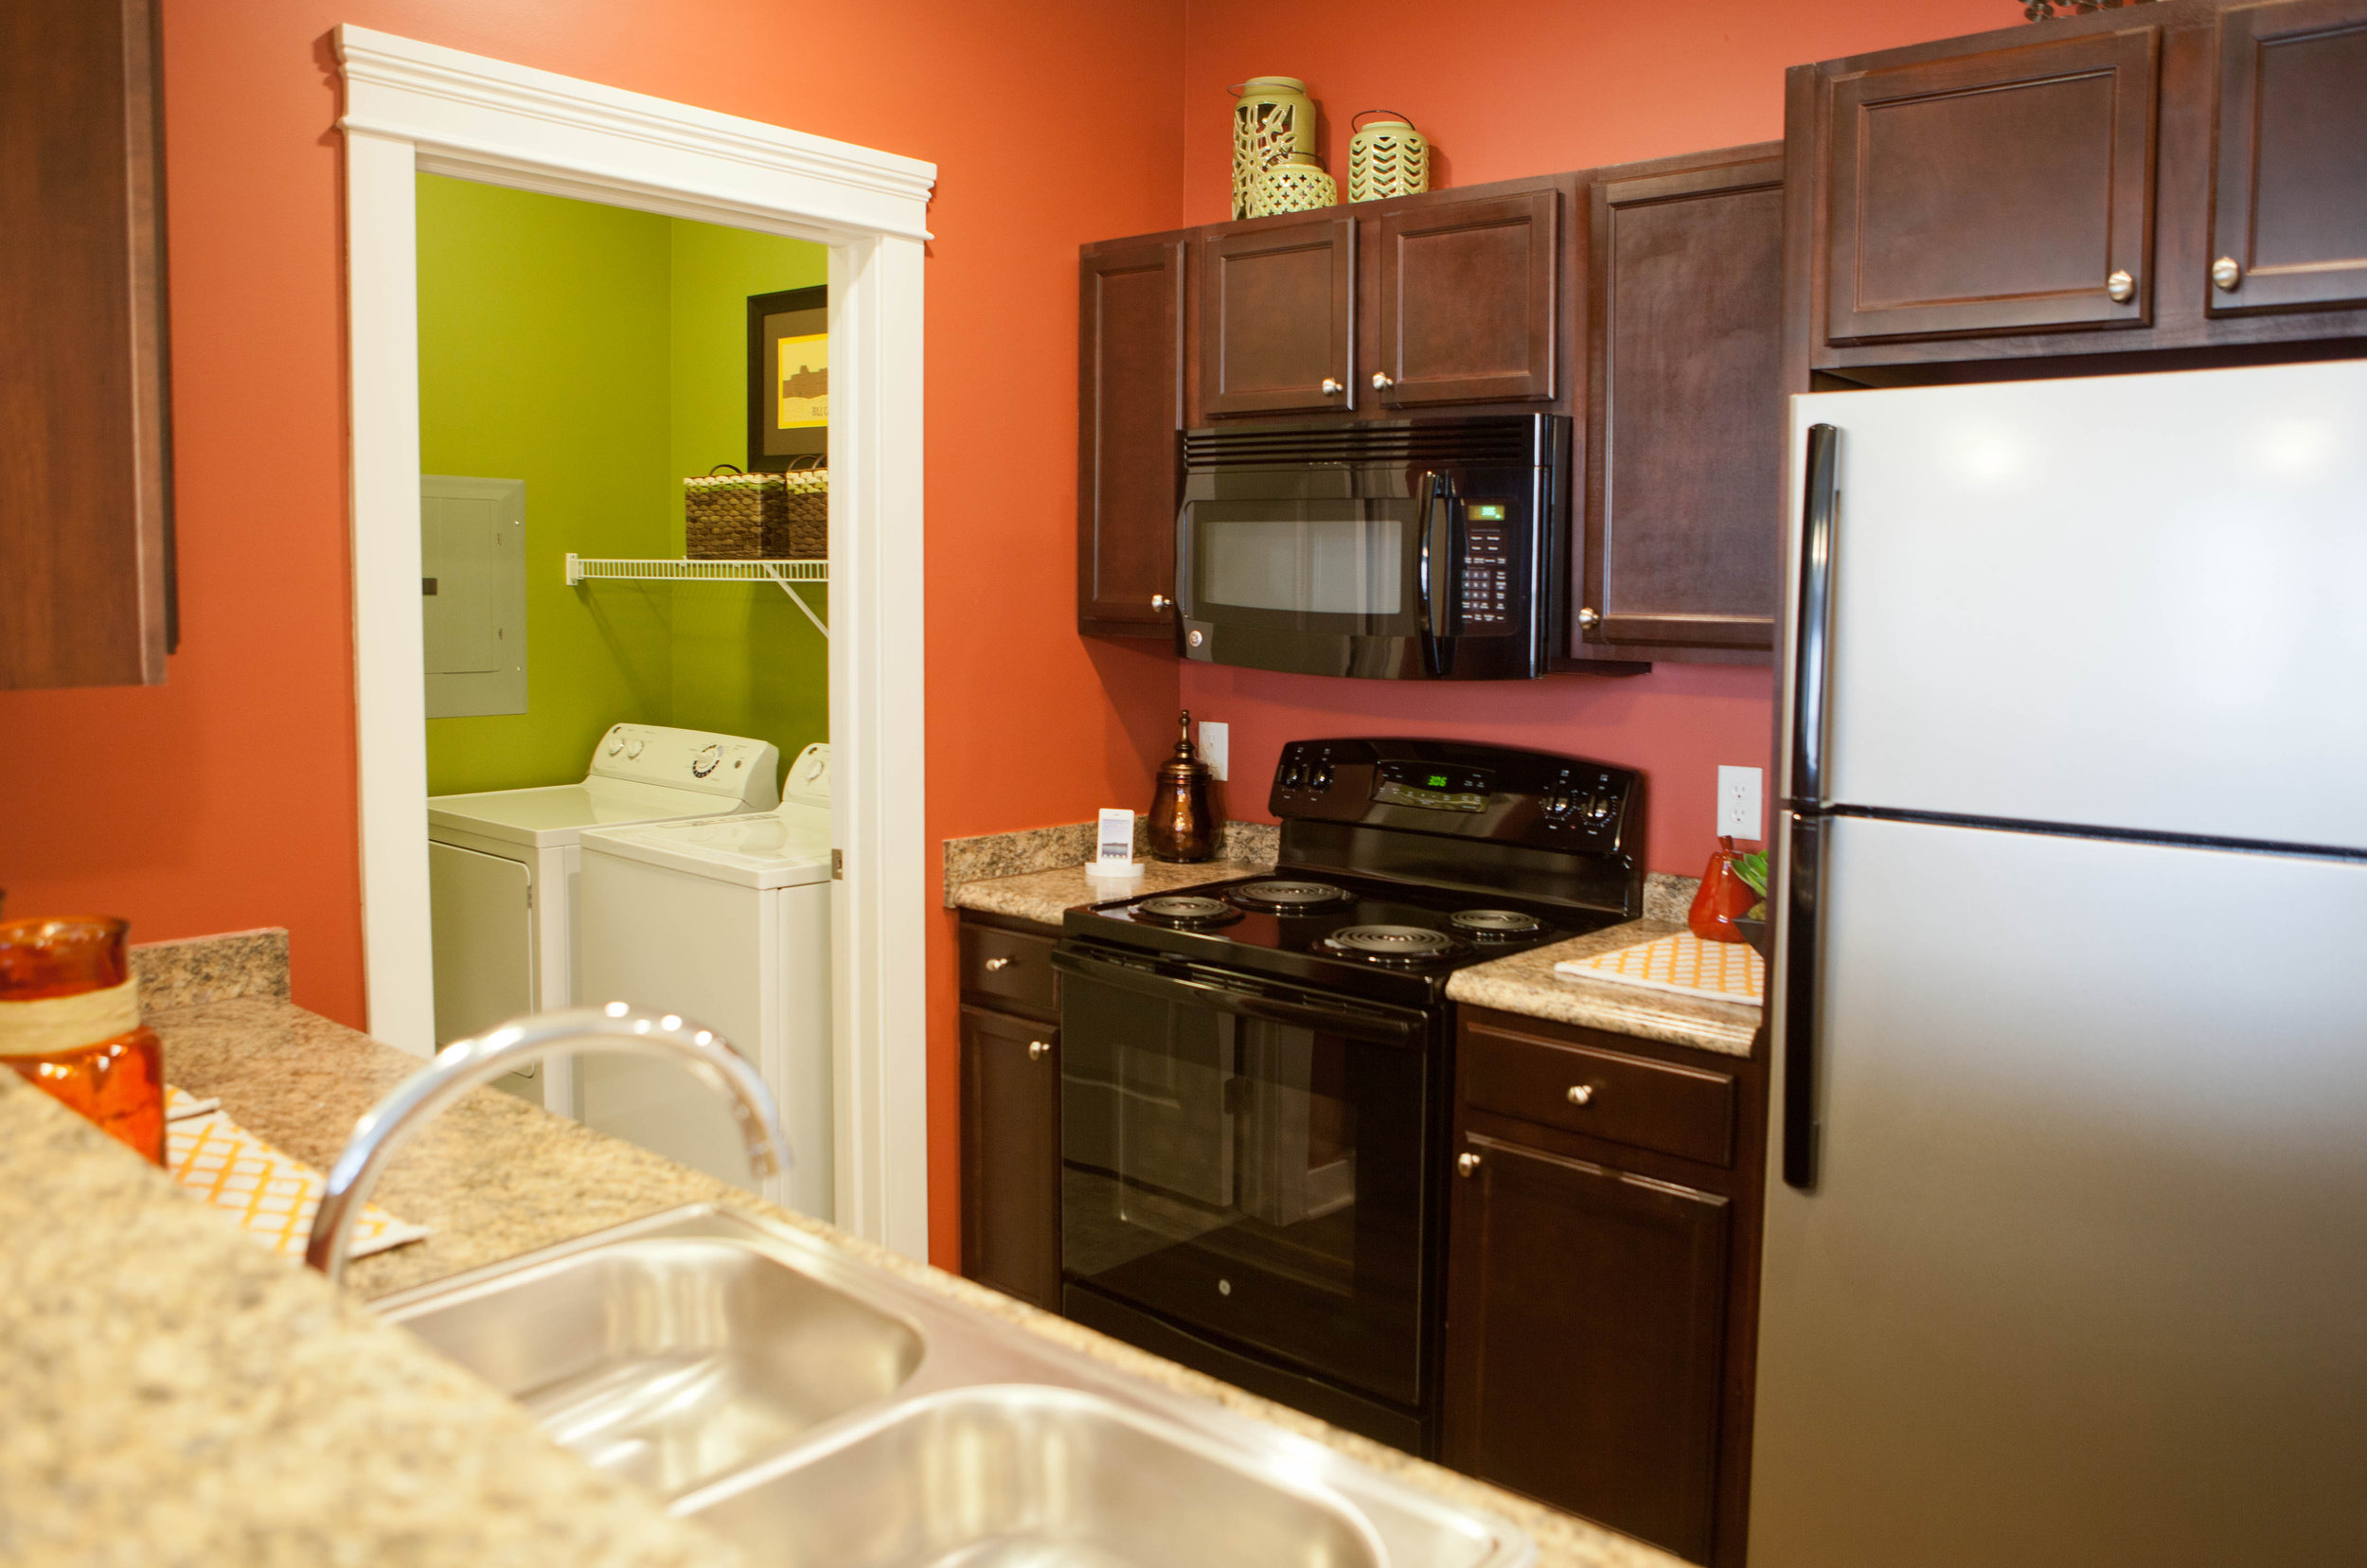 Ivy - model kitchen (apartment).jpg